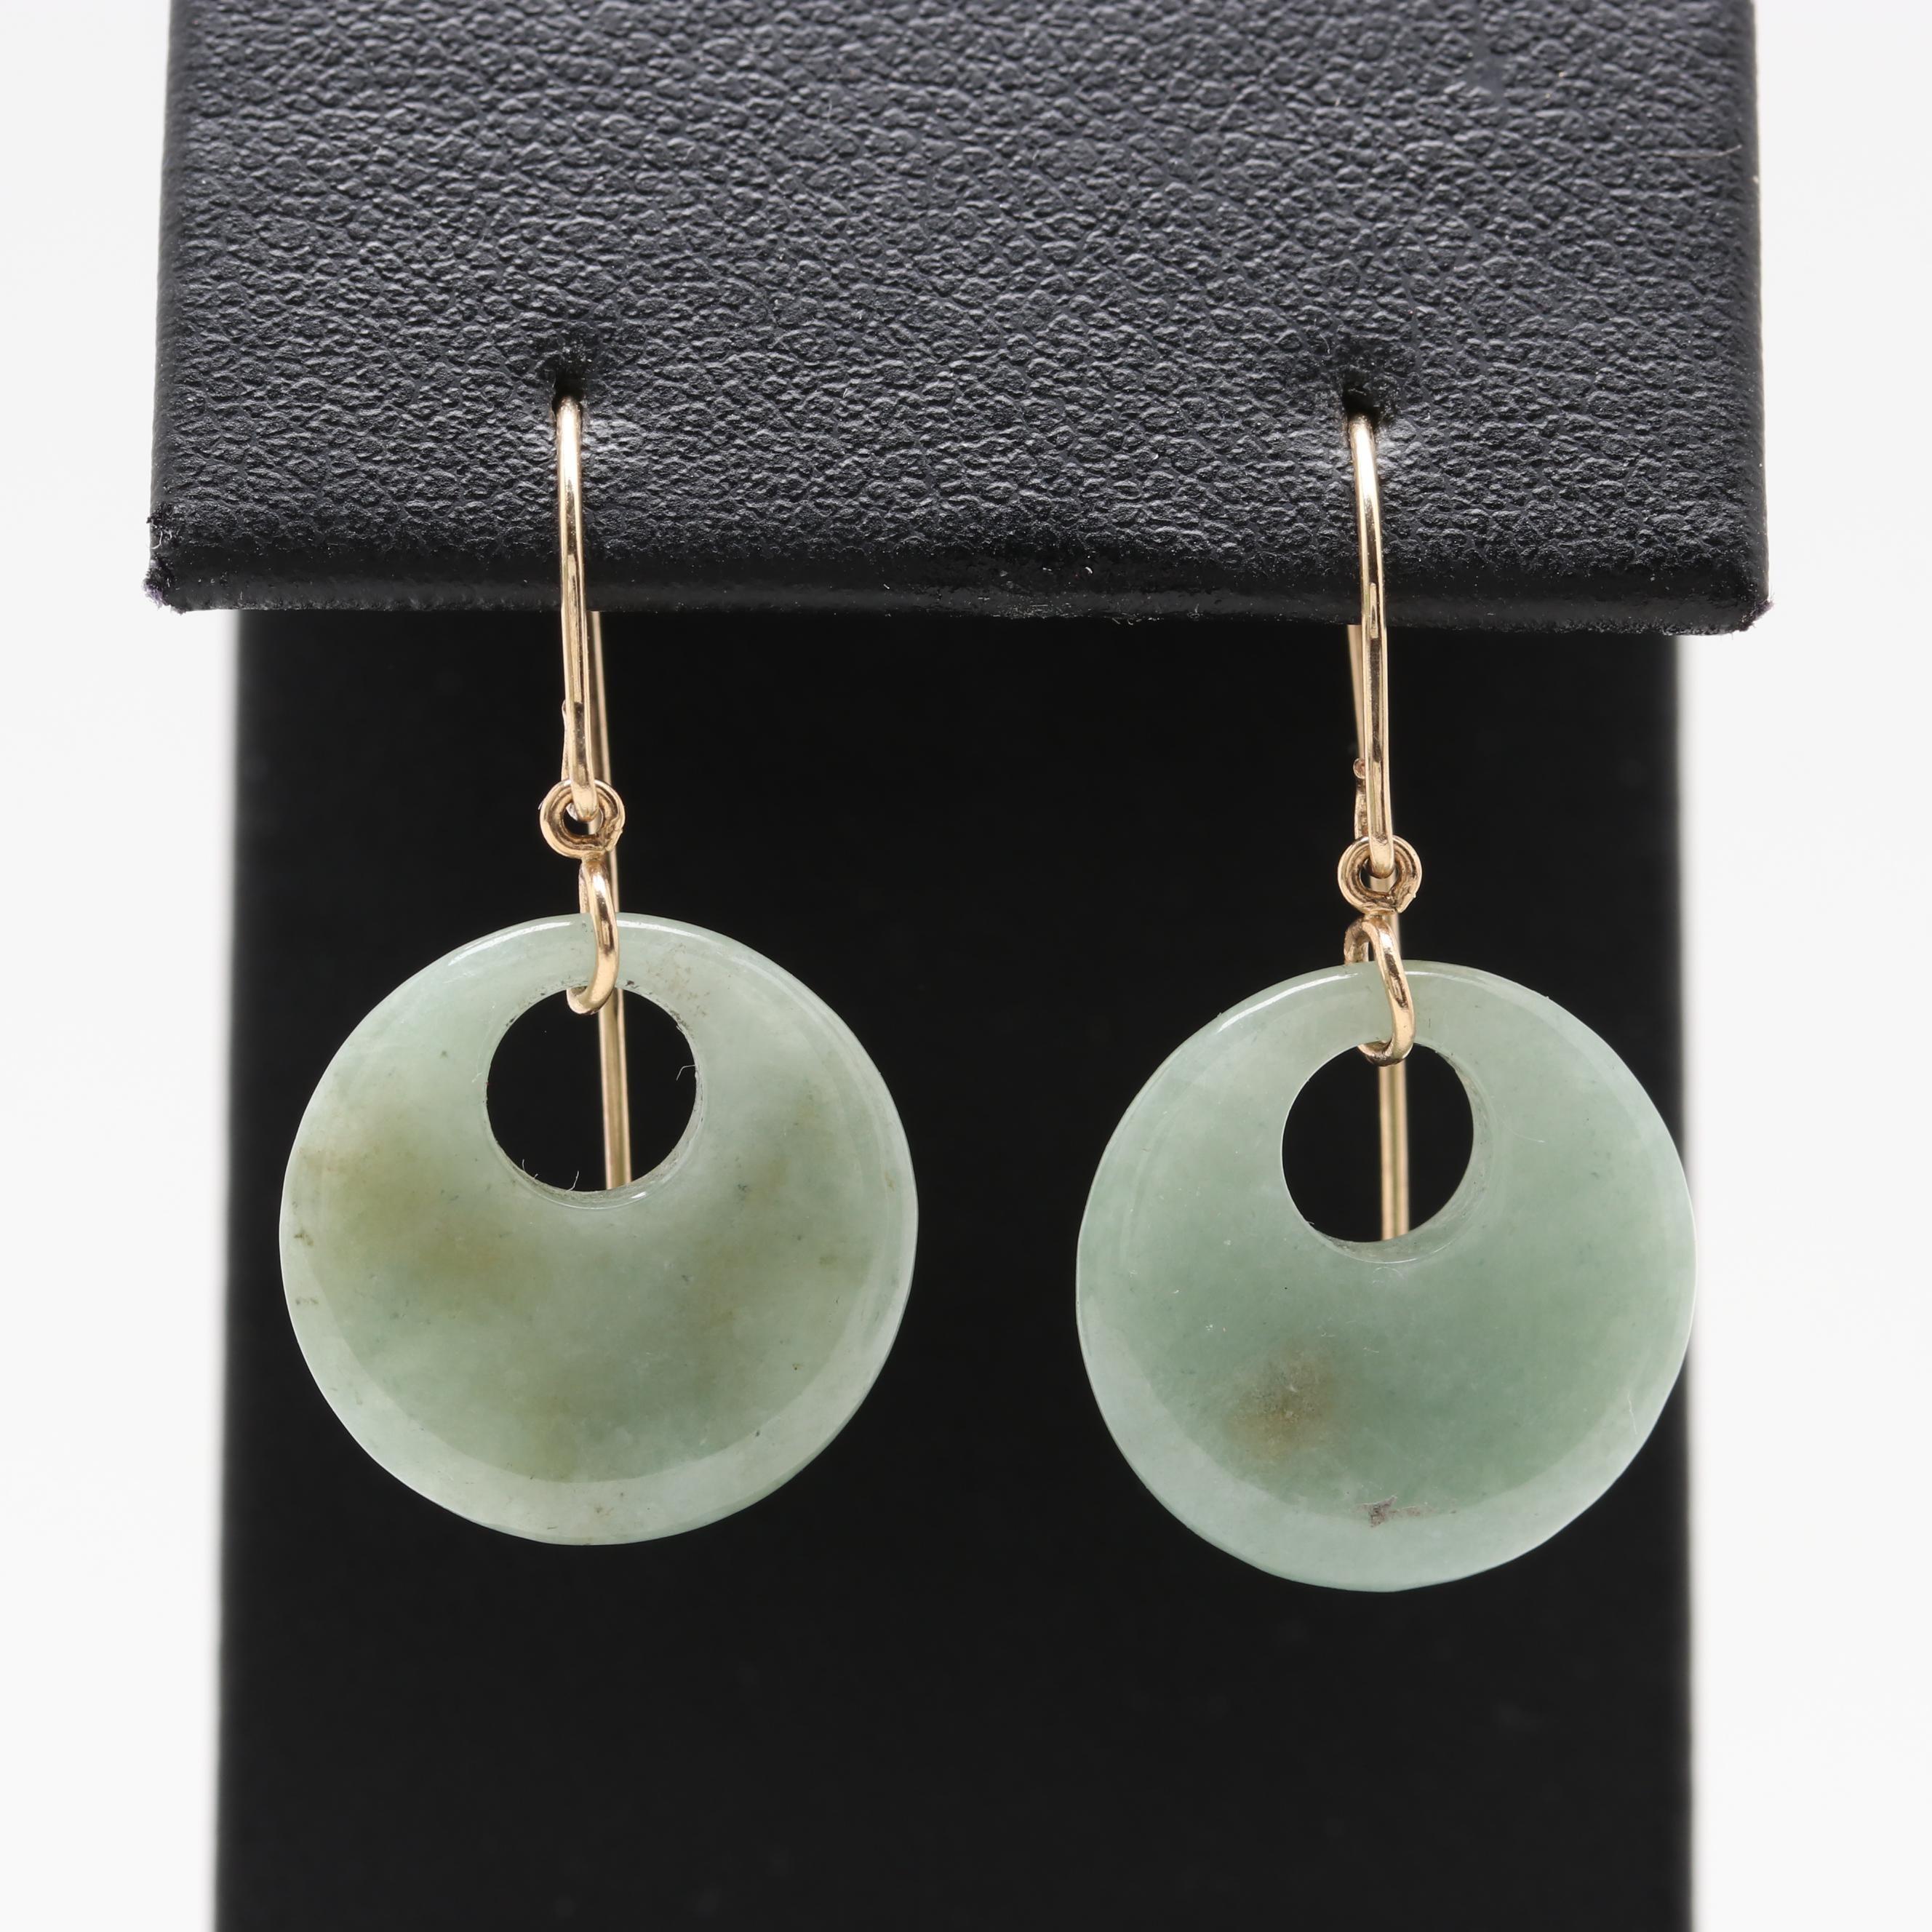 14K Yellow Gold Carved Jadeite Dangle Earrings